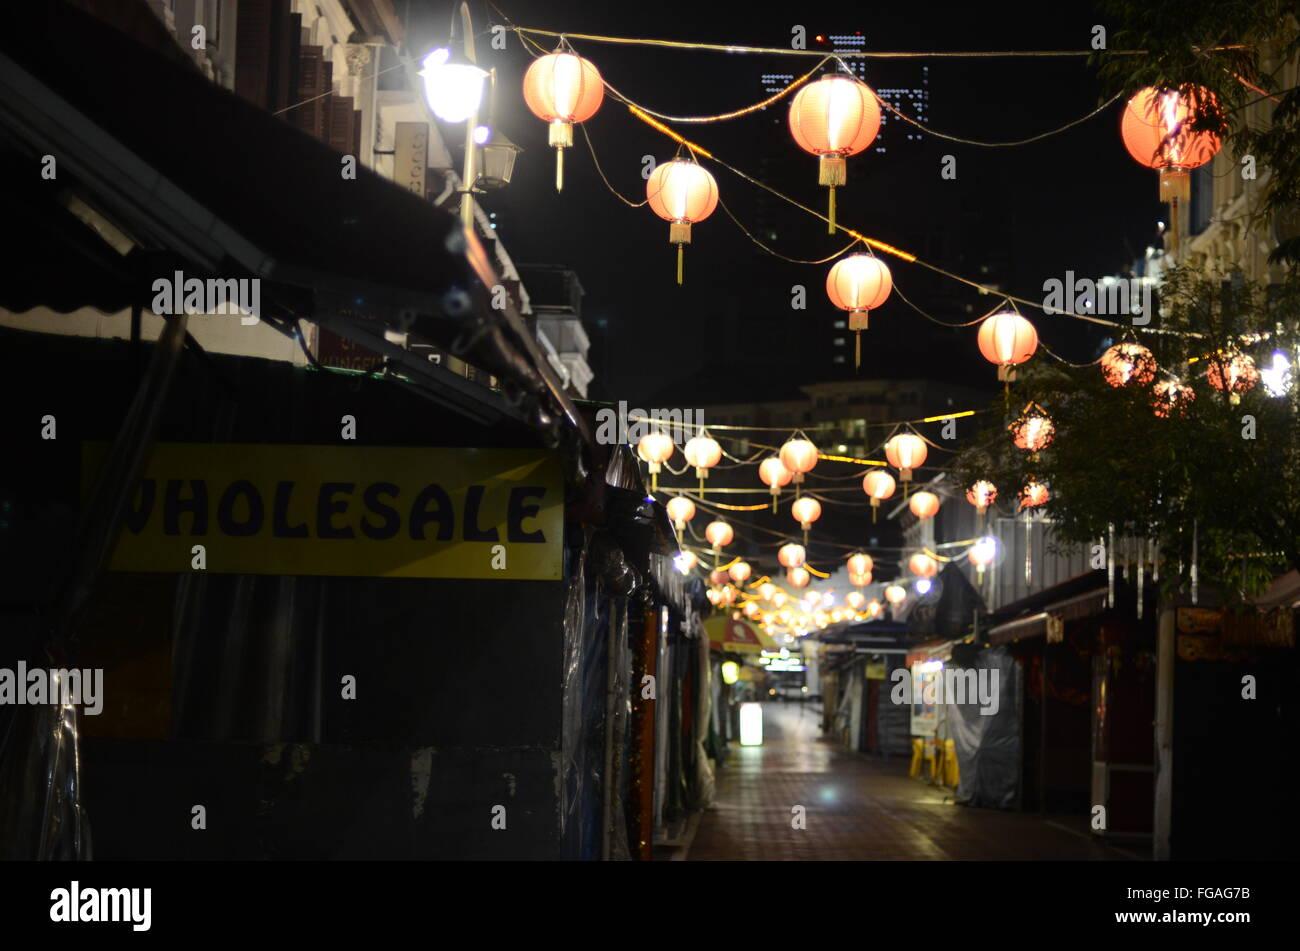 Illuminated Lanterns Hanging On Alley Amidst Market Stalls - Stock Image